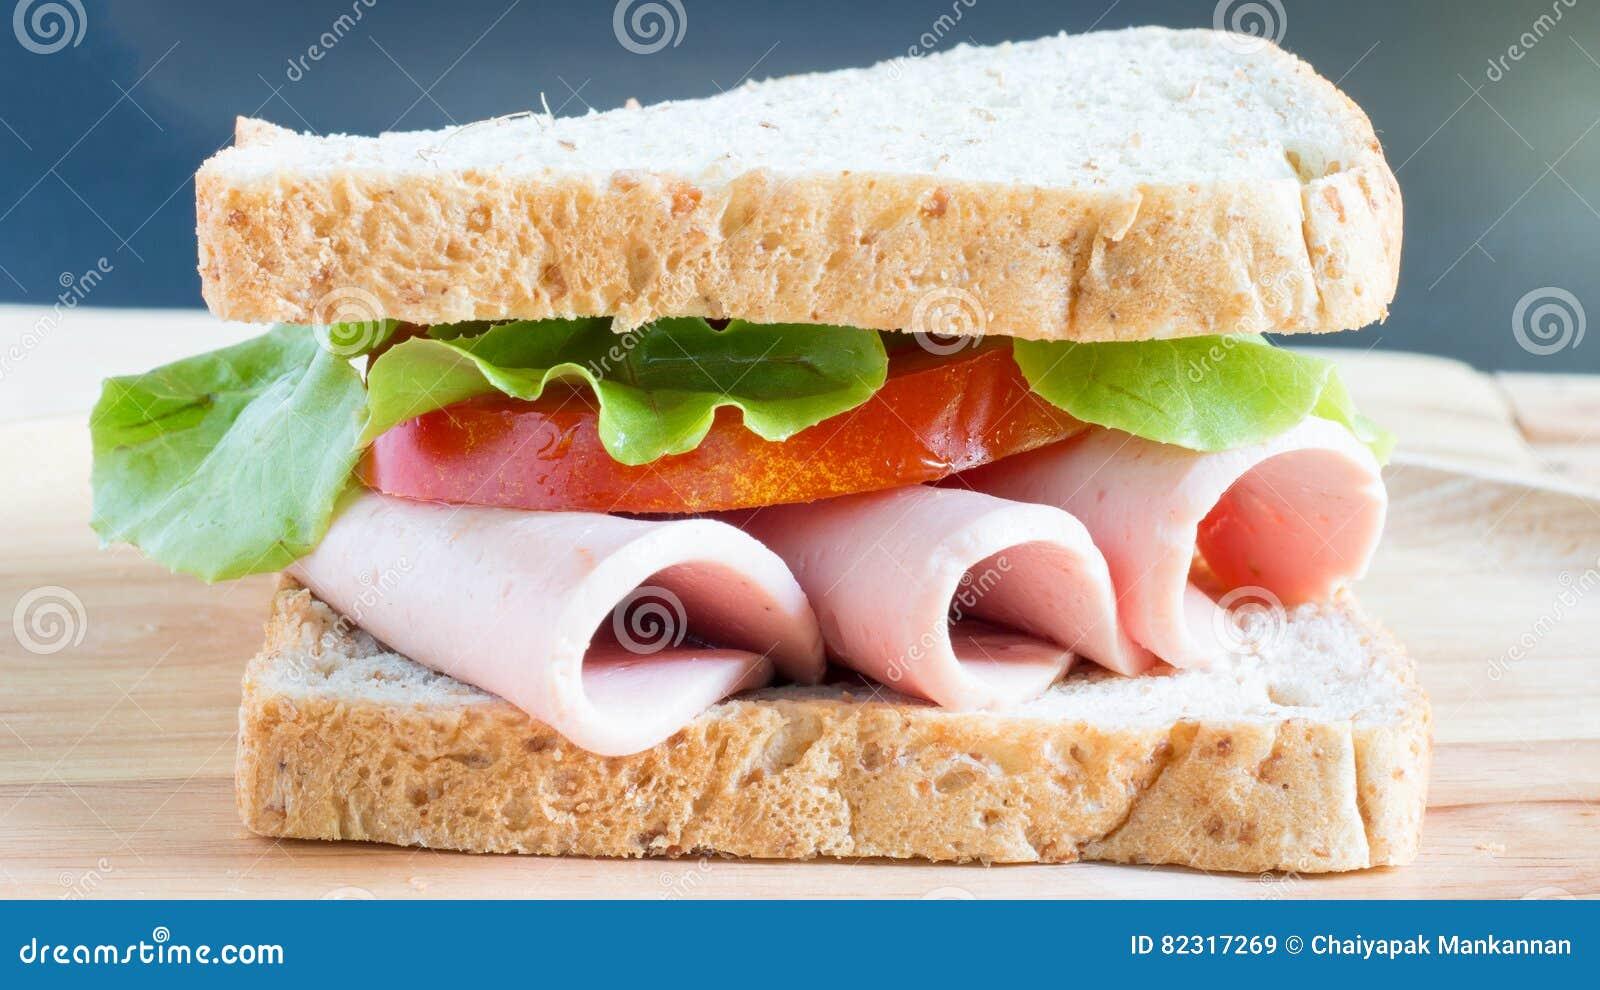 Sandwich bologna stock image. Image of vegetables, sausage ...